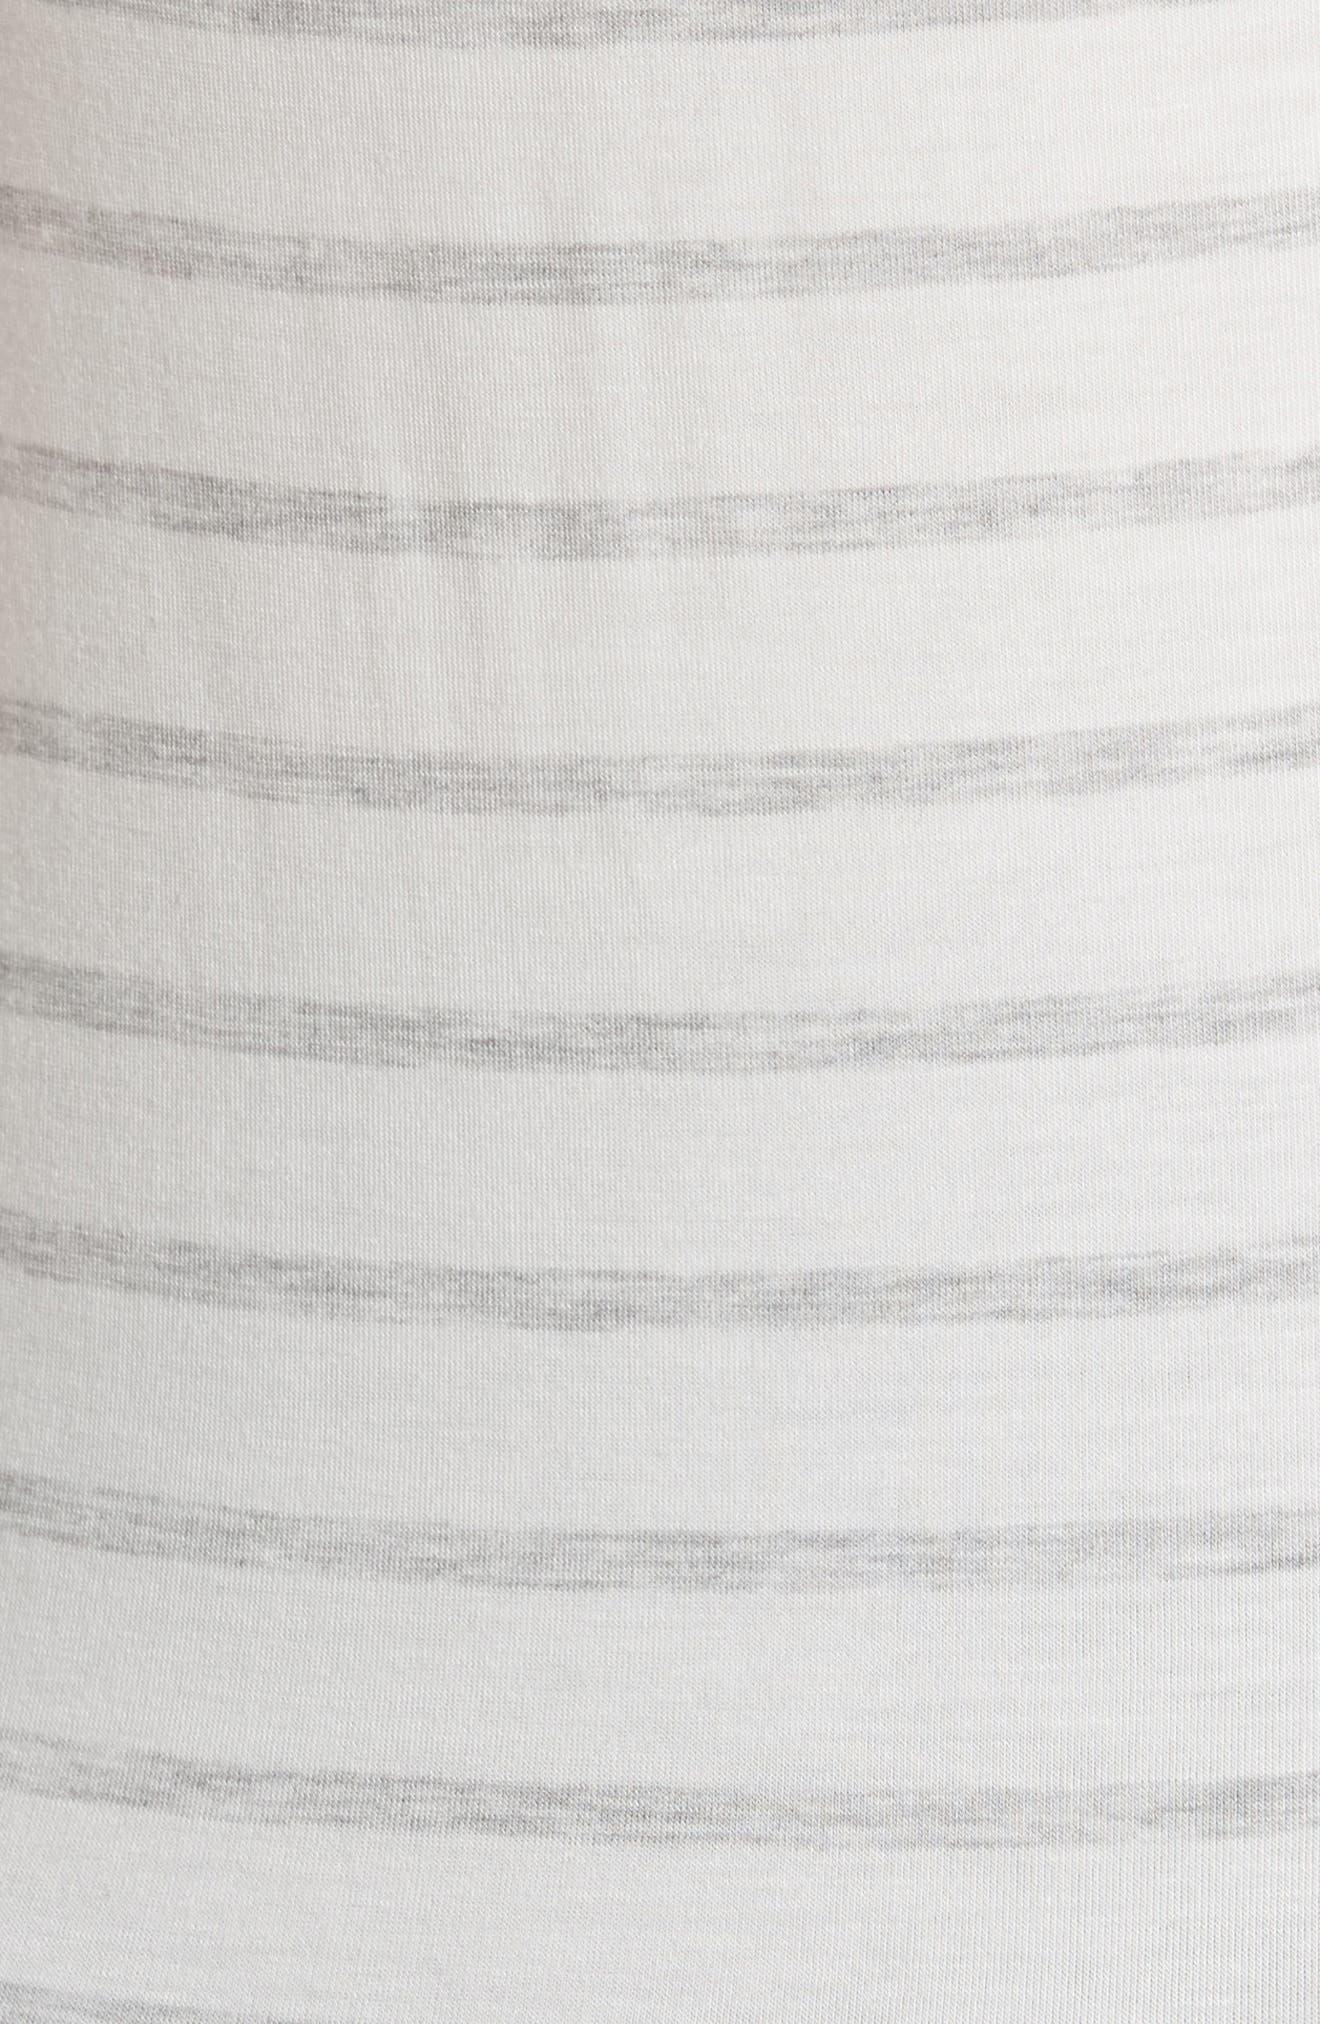 Stripe Scoop Neck Tank Top,                             Alternate thumbnail 5, color,                             333-Milk/ Nacre Chine